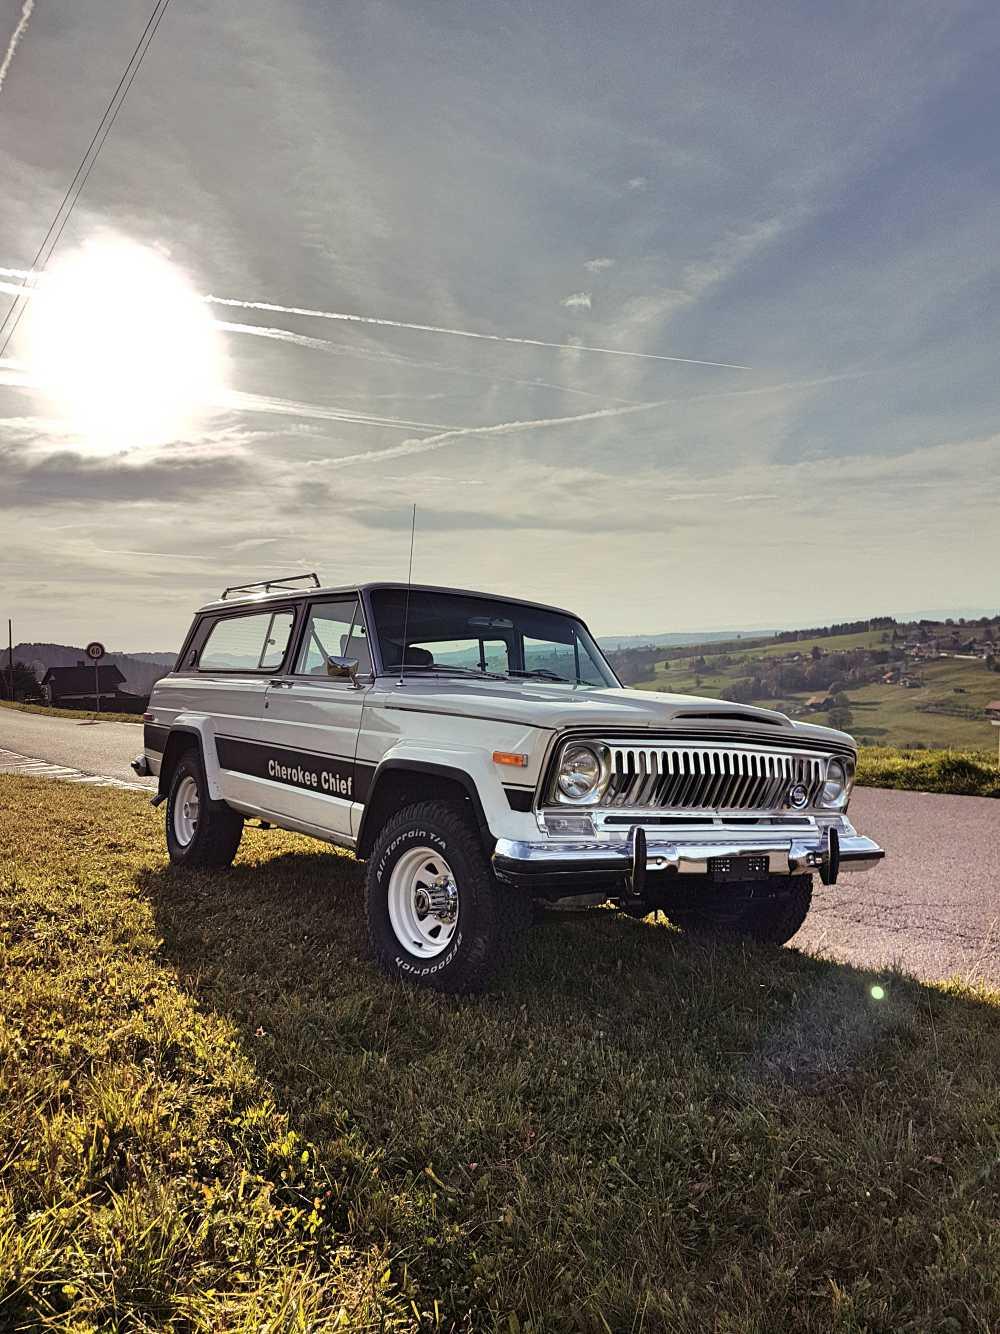 jeep-cherokee-chief-1978-shooting-moleson-66